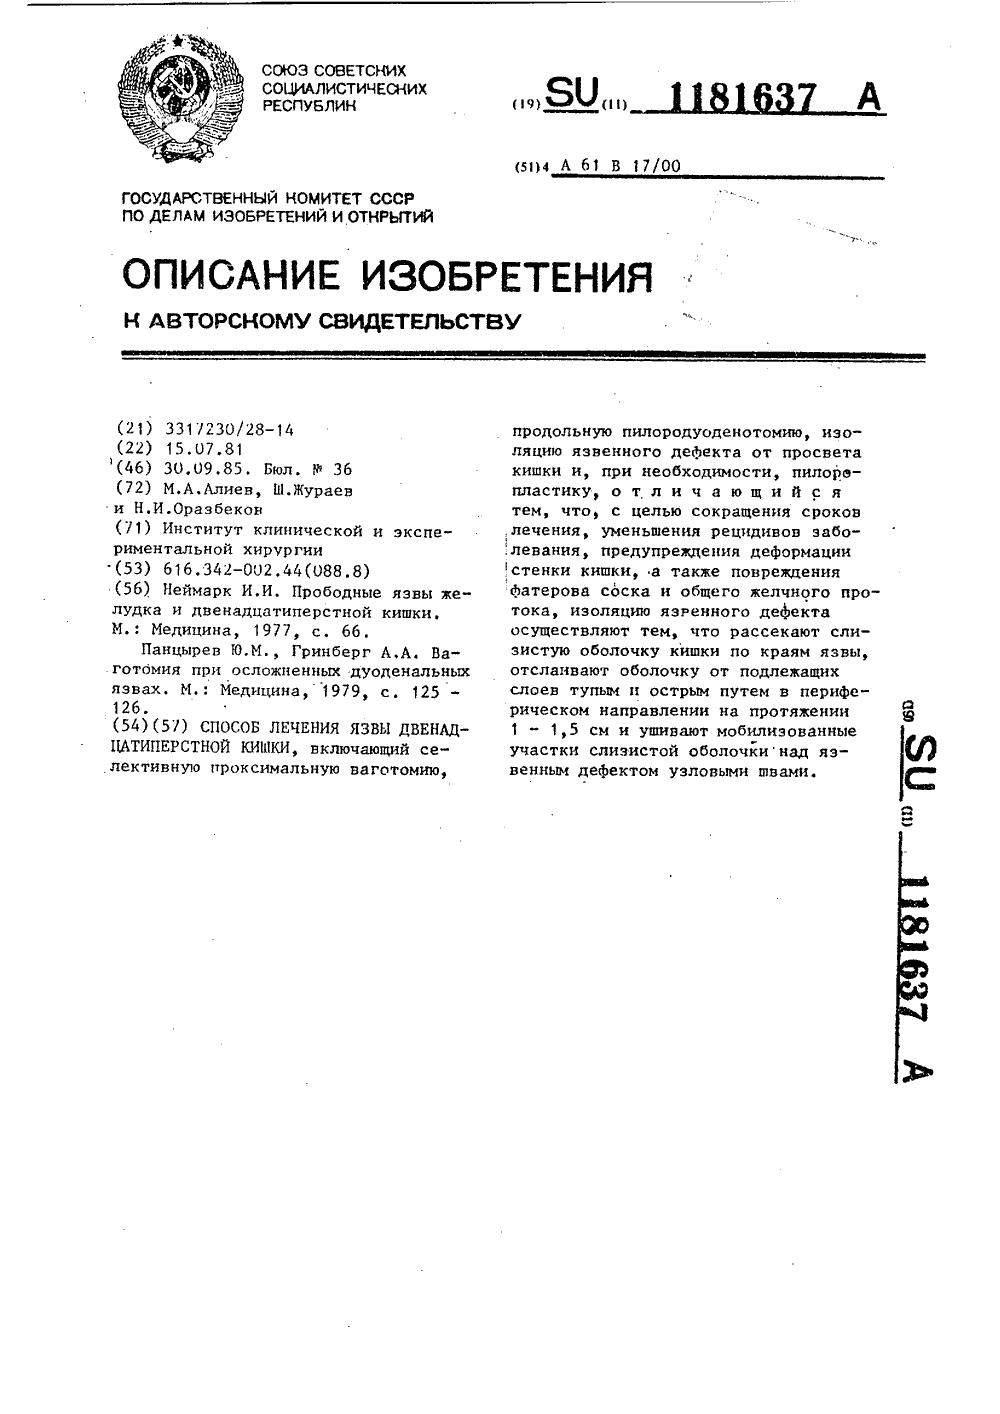 Дуоденостомия